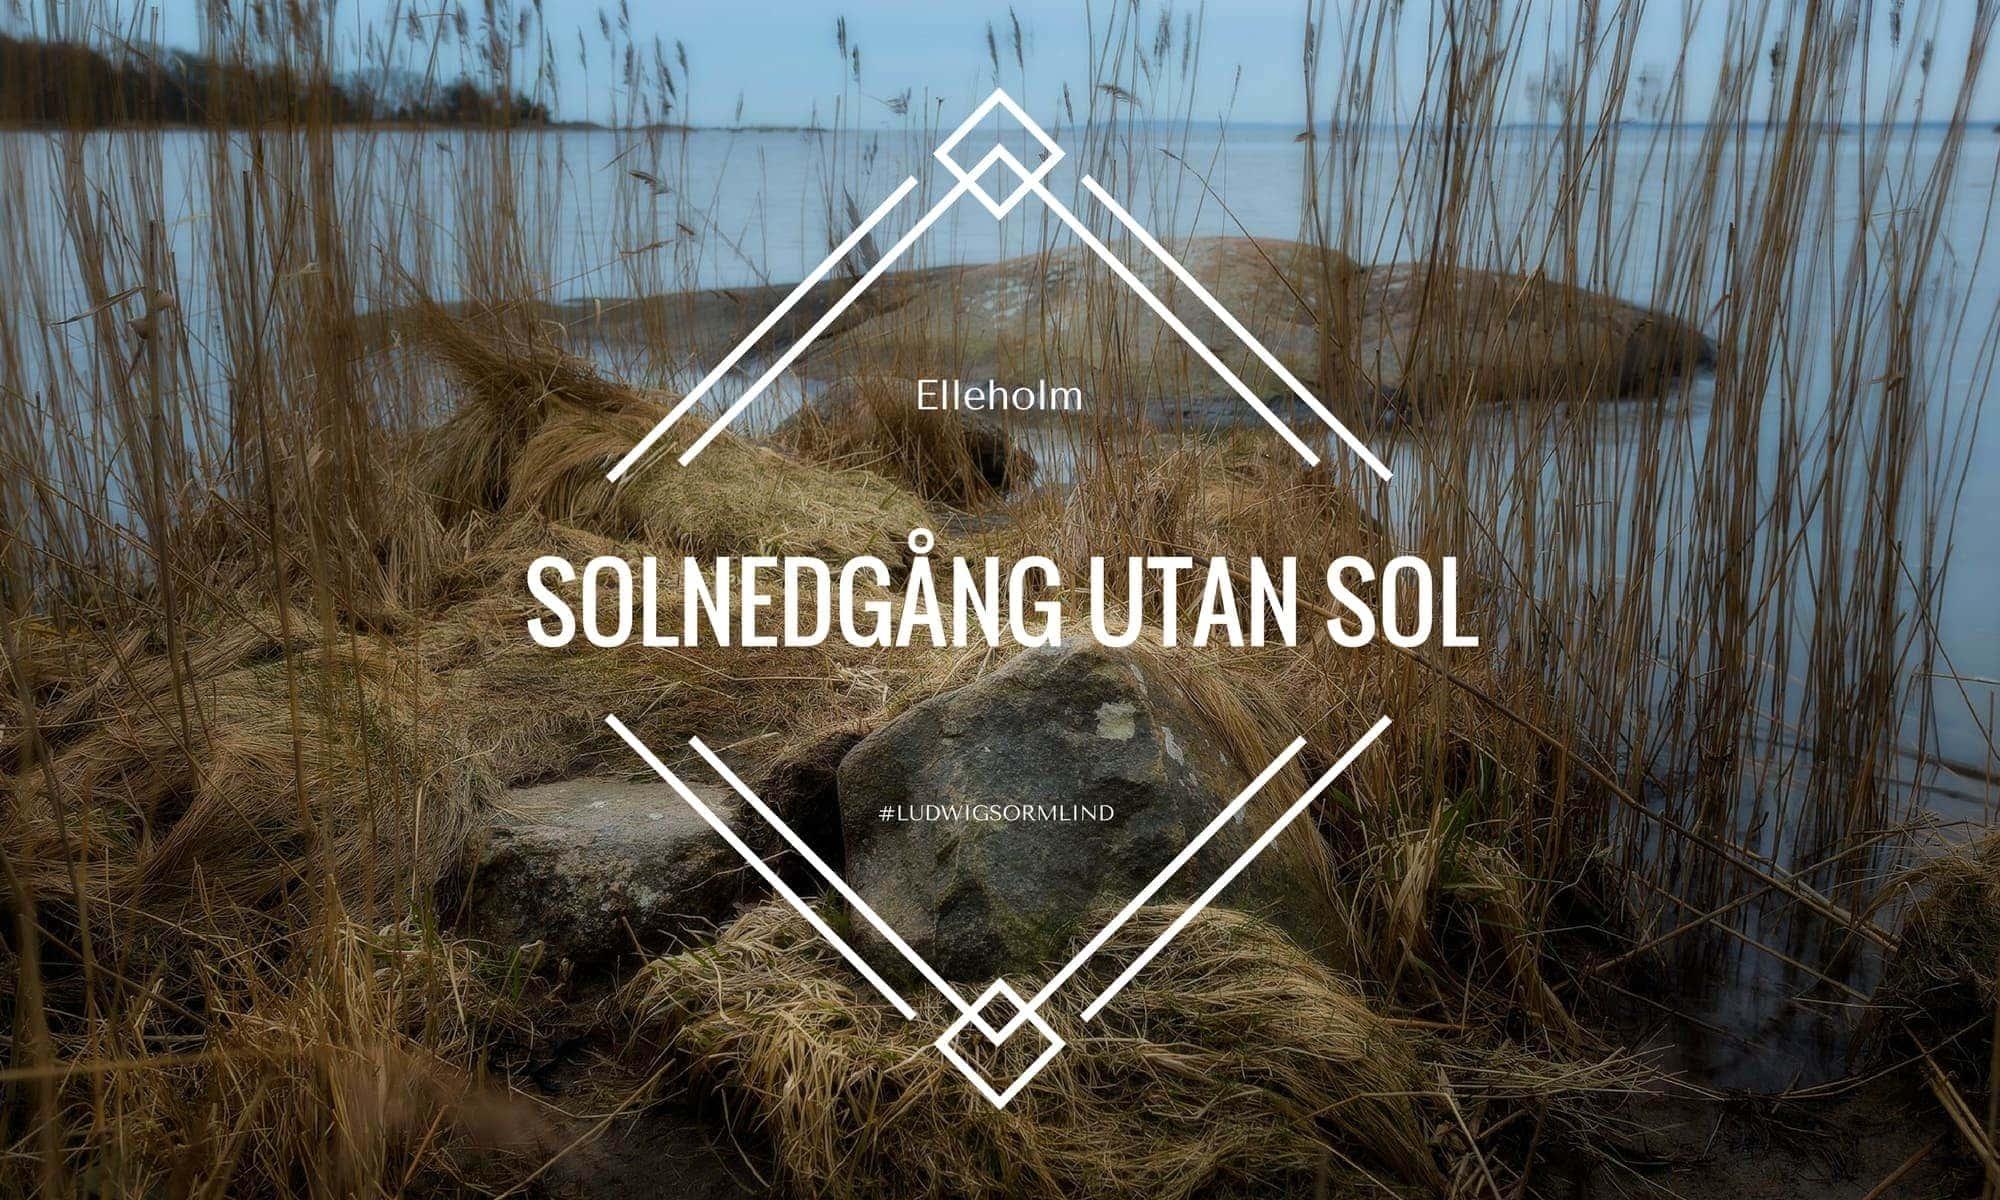 Elleholm Solnedgång utan sol - Ludwig Sörmlind